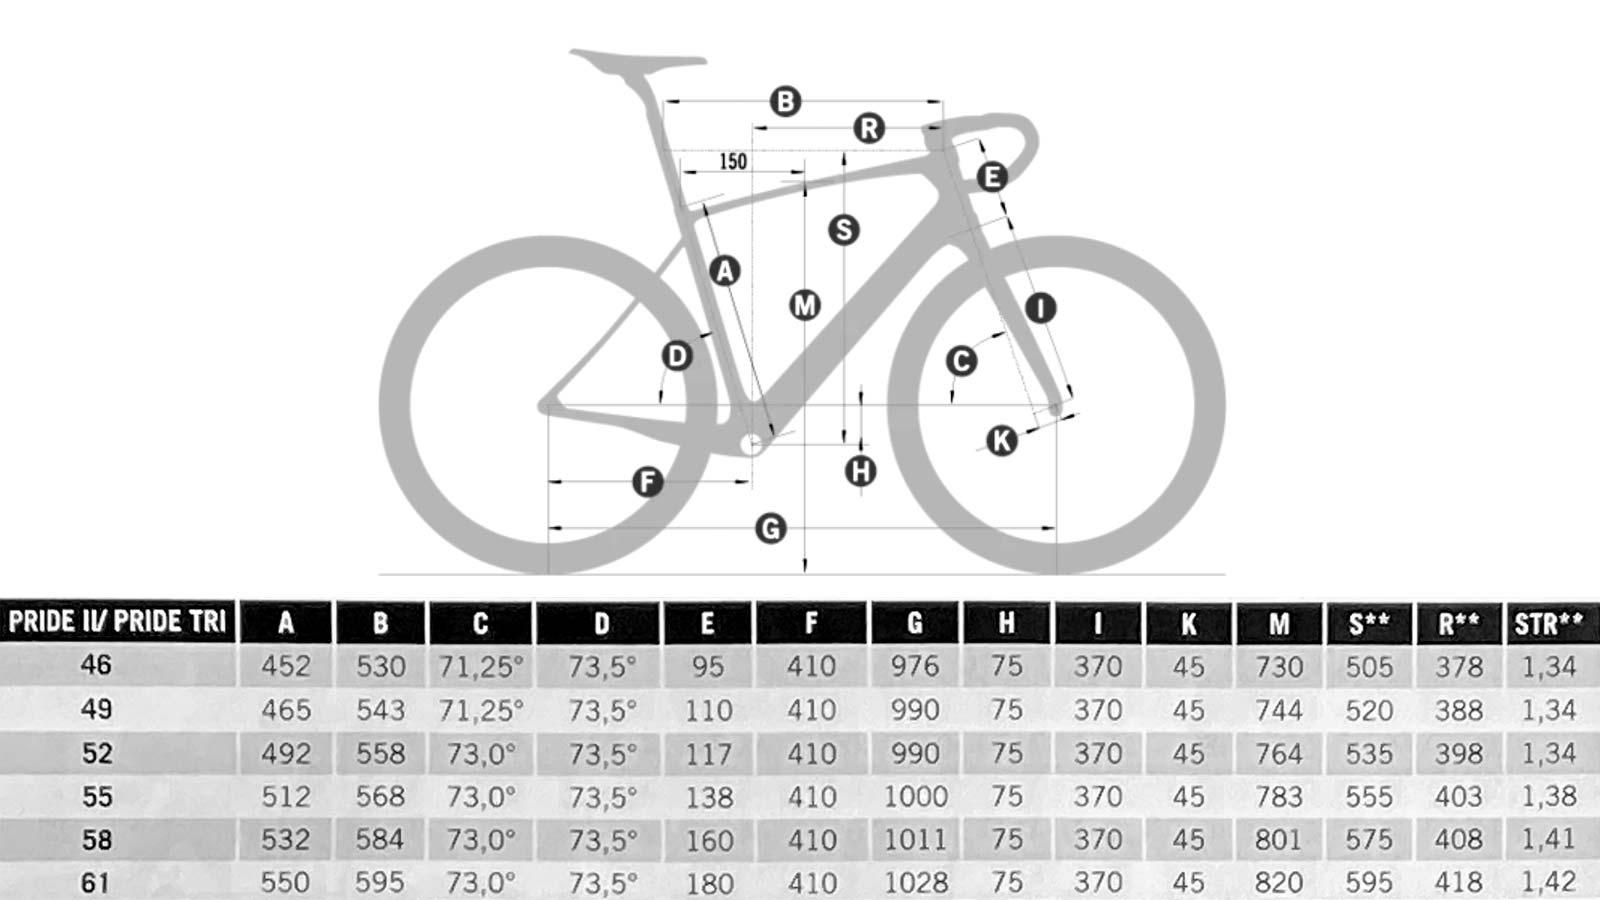 Simplon Pride II disc brake carbon aero road bike,geometry